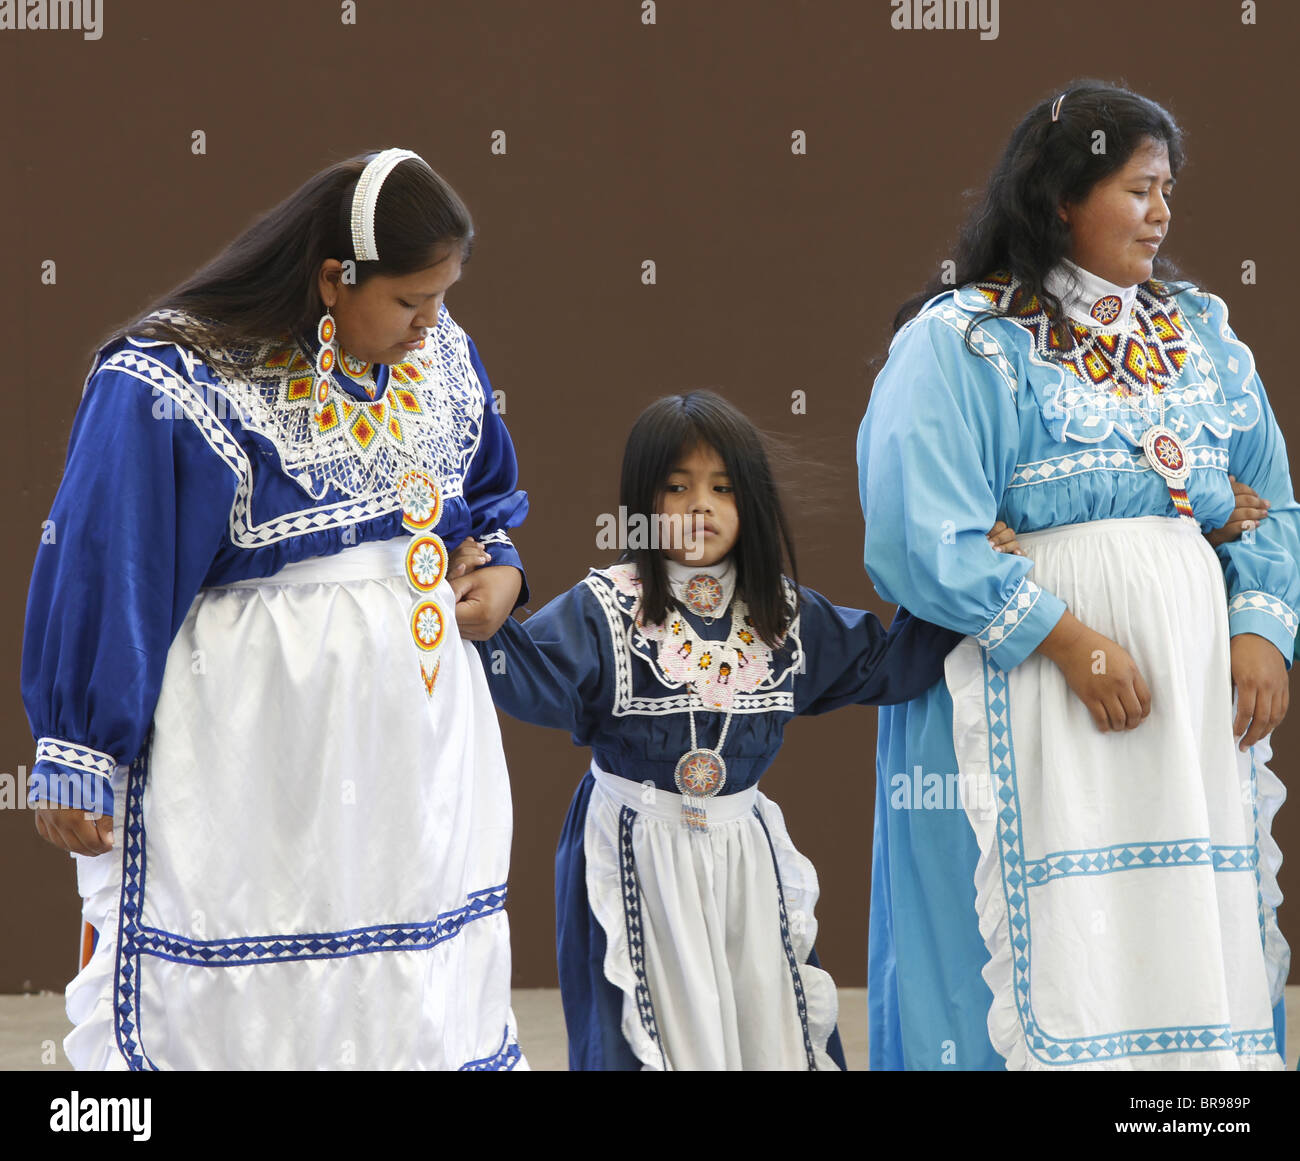 Cherokee, North Carolina -  Chactaw Indians women and a girl performing a social dance. - Stock Image